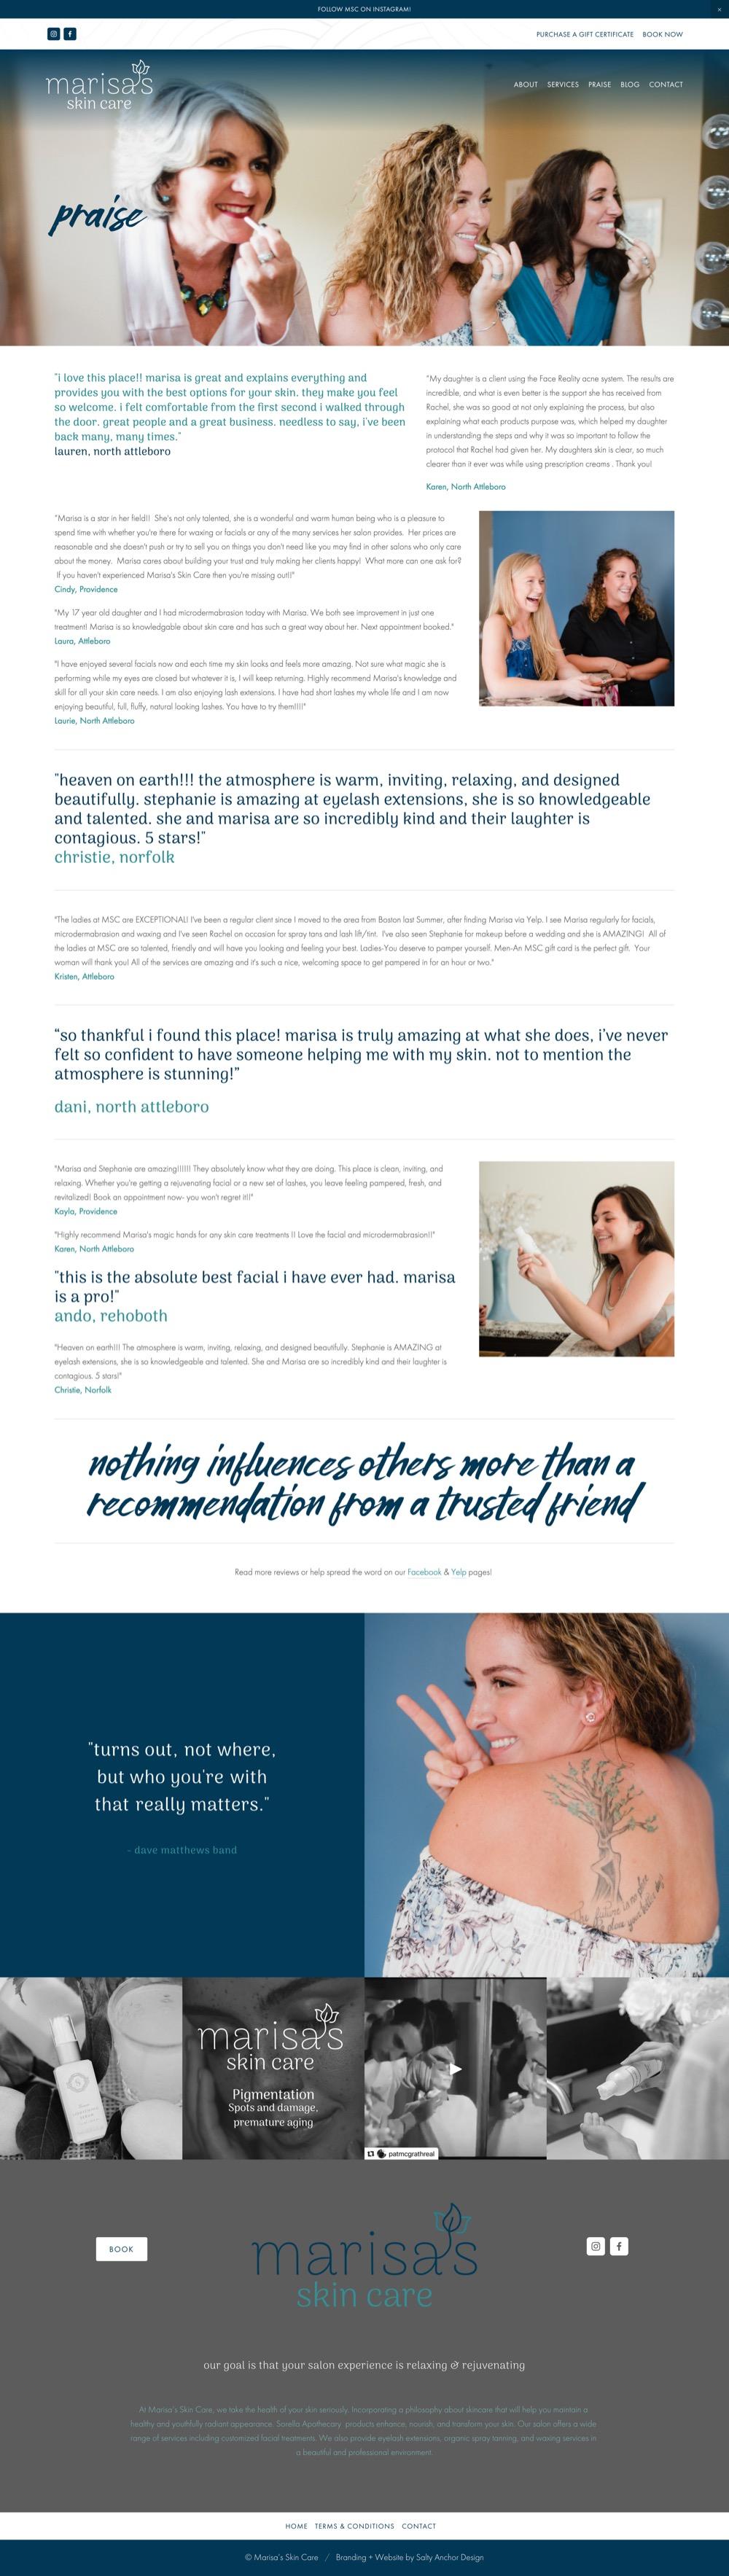 Squarespace Website Custom Design Testimonials